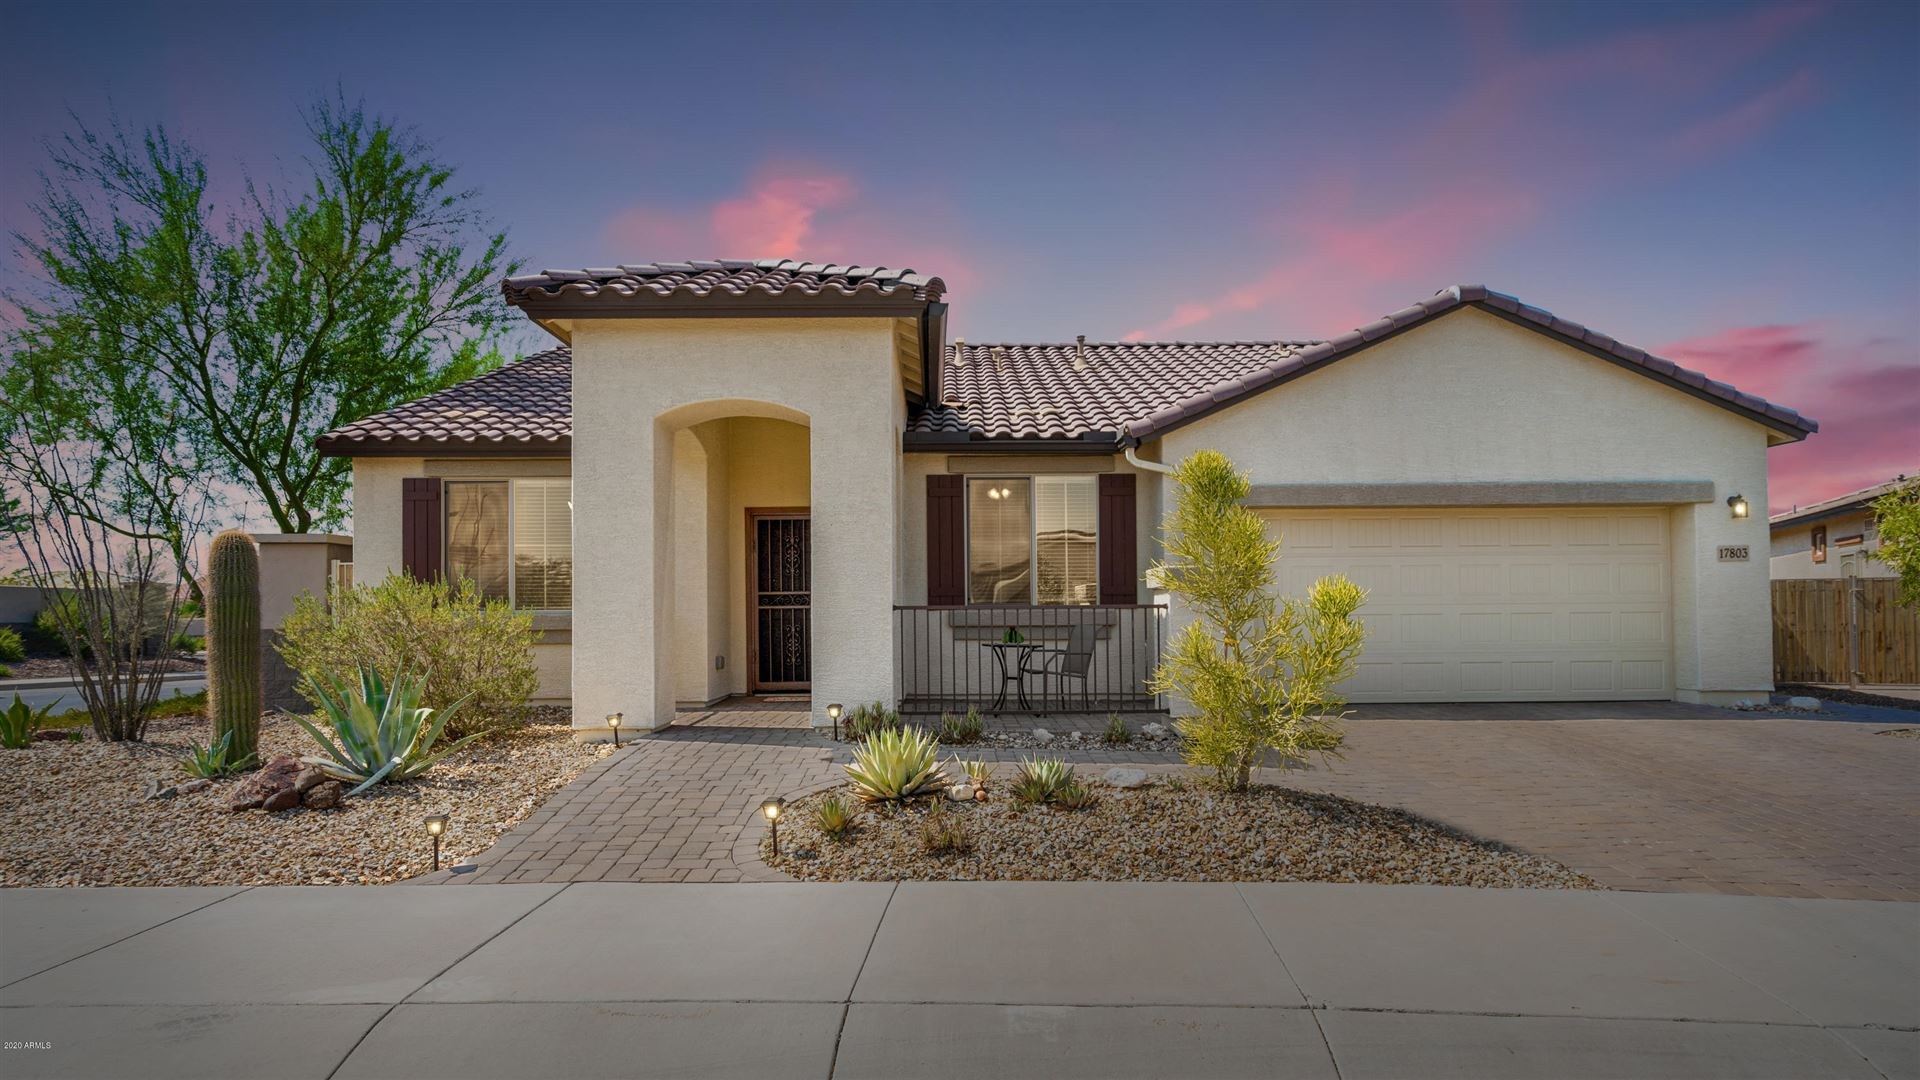 17803 W FAIRVIEW Street, Goodyear, AZ 85338 - MLS#: 6120115